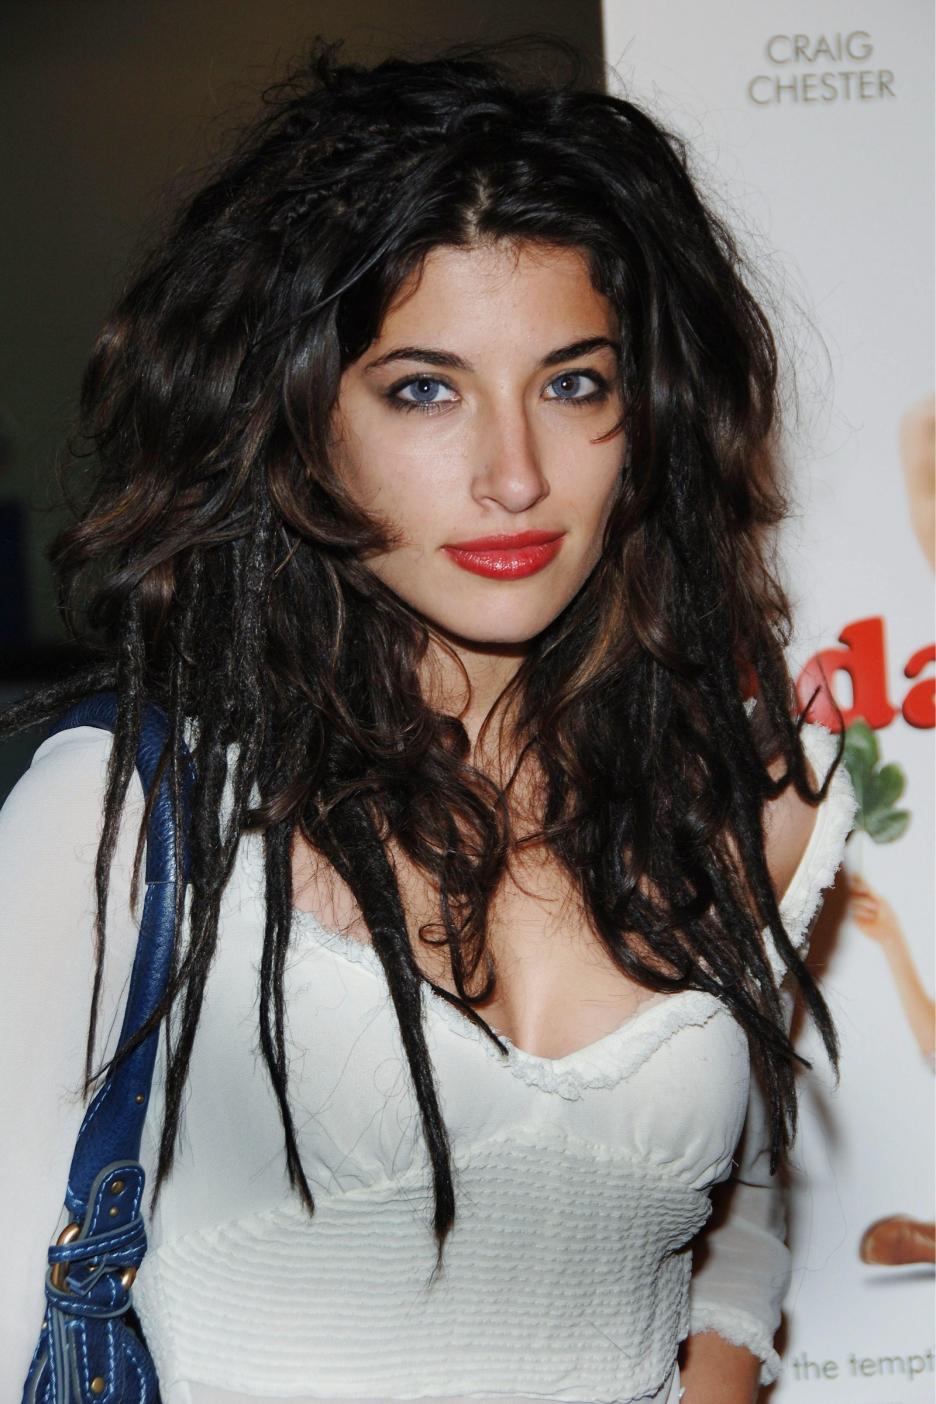 Faces: Tania Raymonde - 22 March 1988